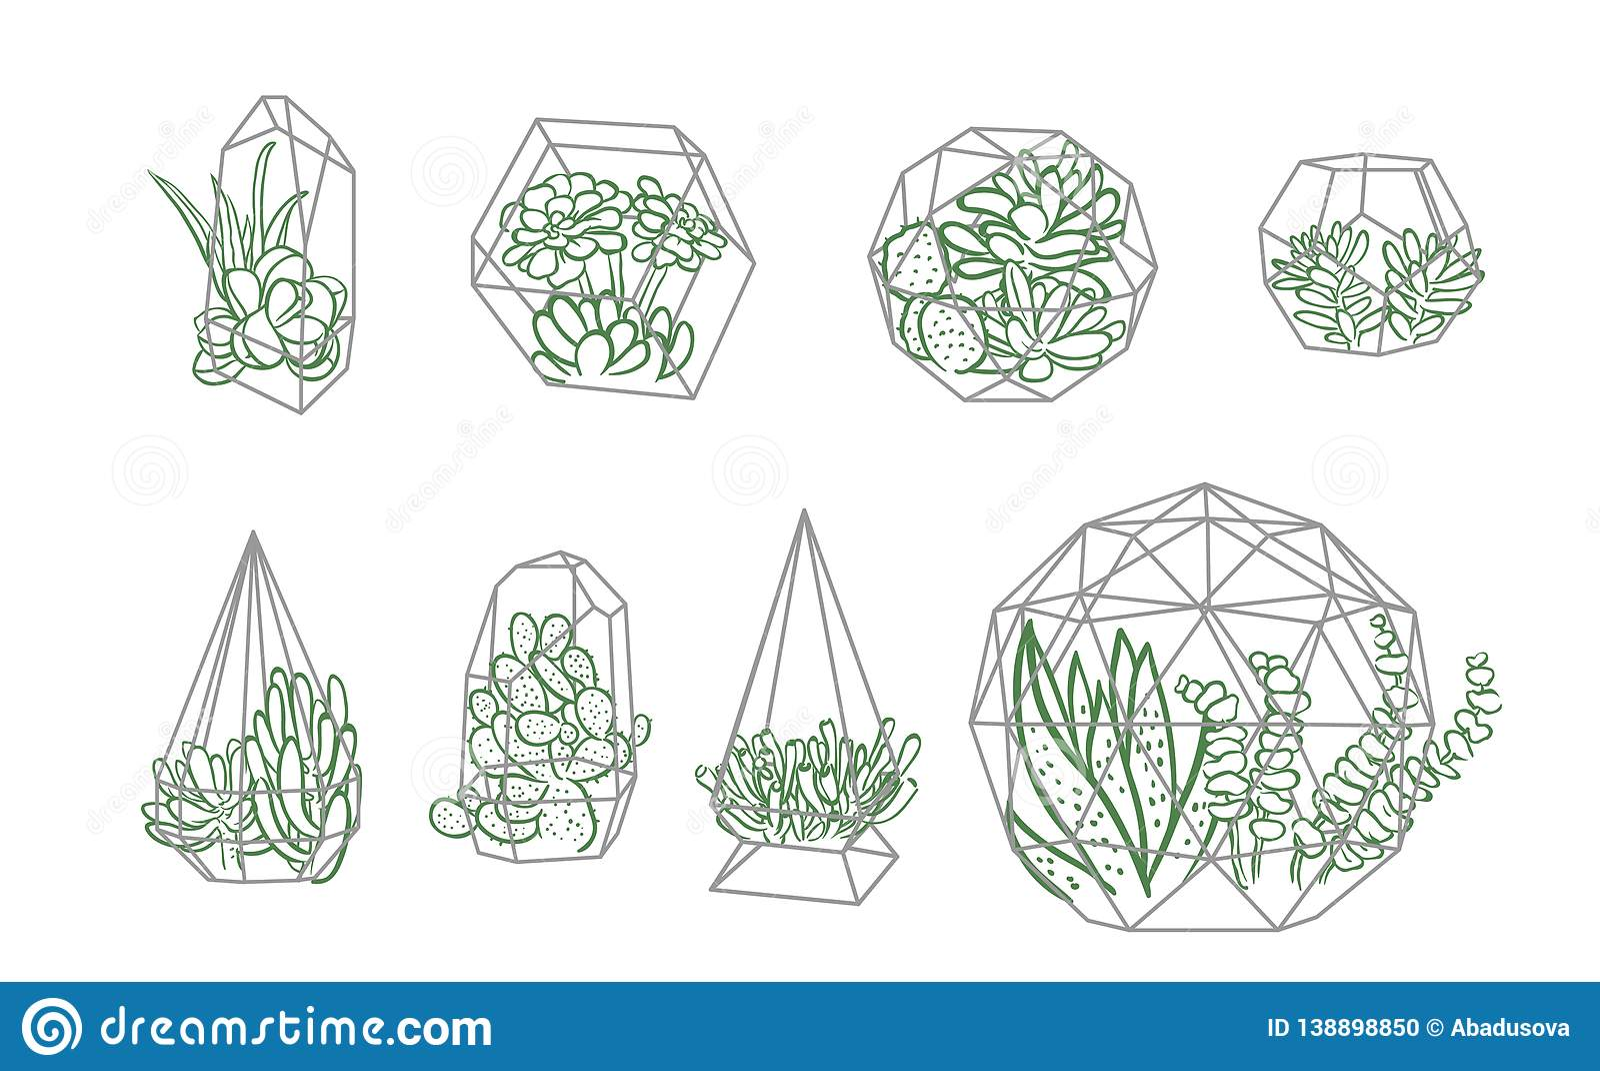 Geometric Terrariums Stock Illustrations 54 Geometric Terrariums Stock Illustrations Vectors Clipart Dreamstime